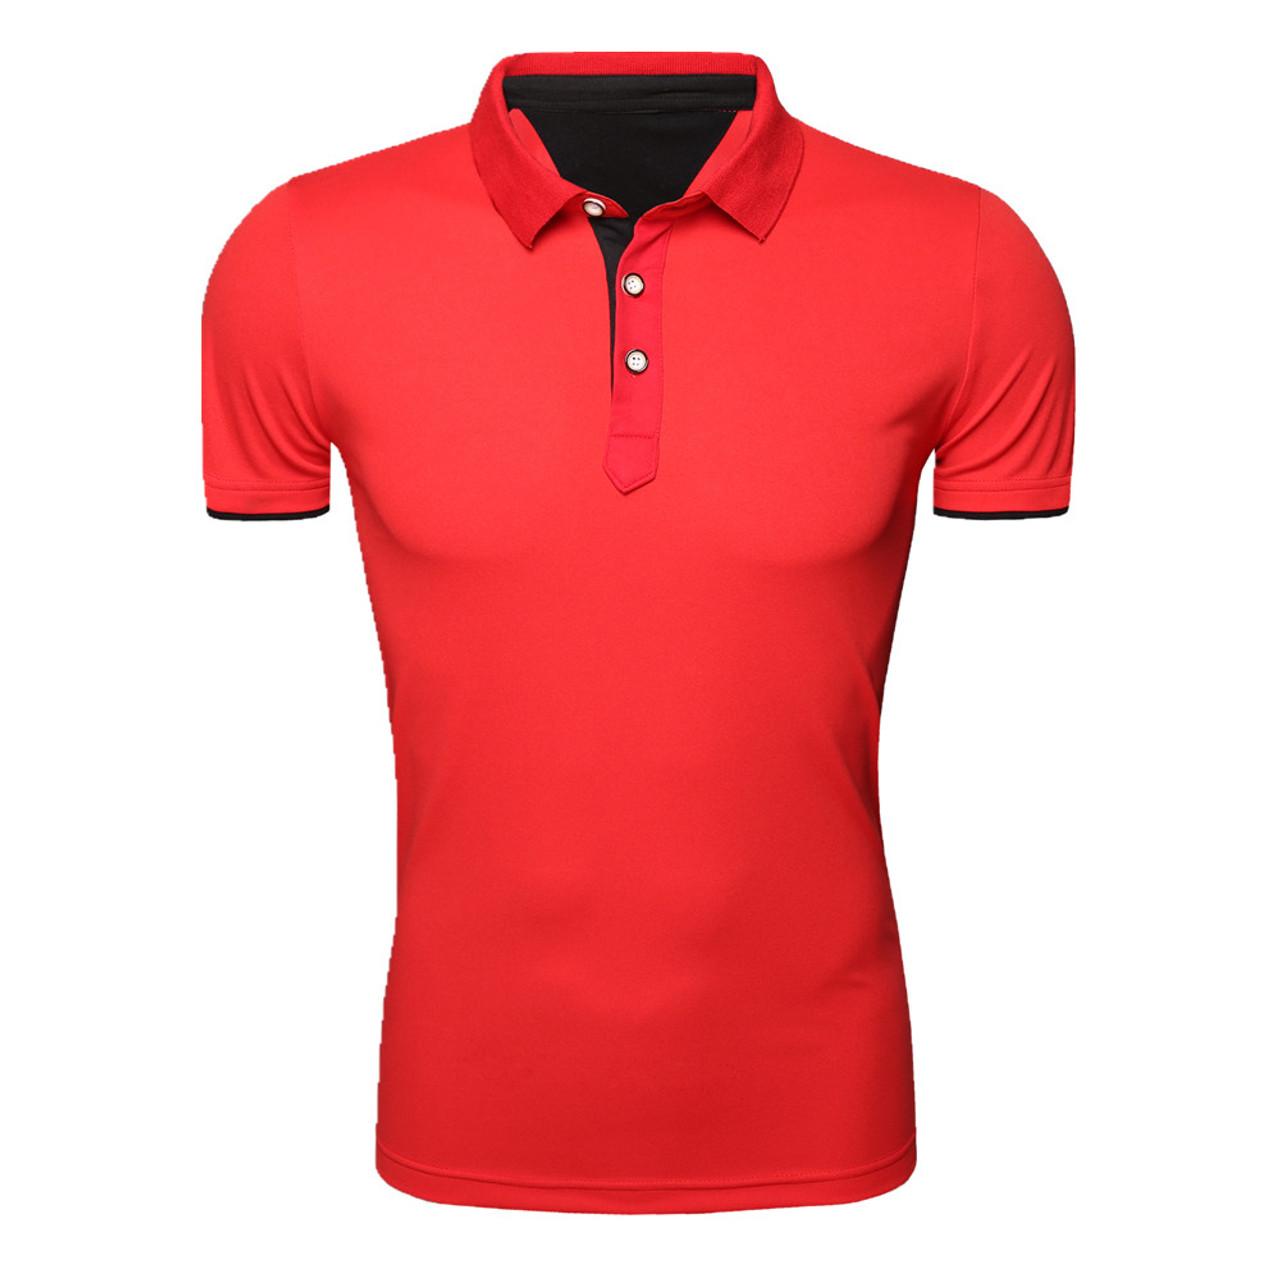 cc2f92bbfab3 ... T-Shirt Mens Fashion Color Printing Shirt Short-Sleeve T Shirt Men Slim  Men ...